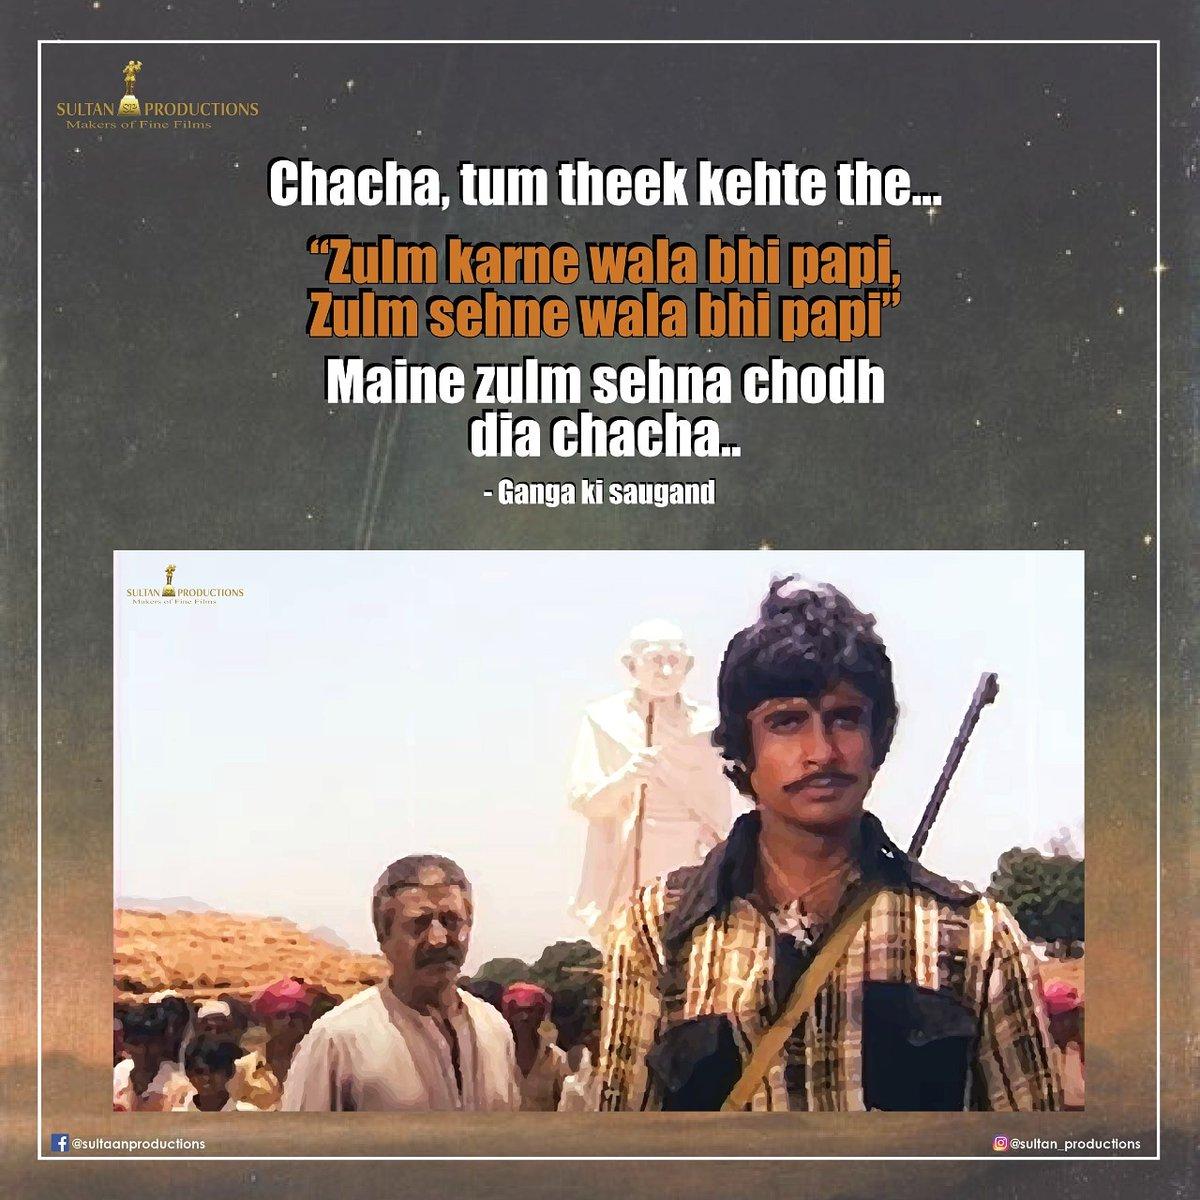 Sultan Ahmed   Ganga Ki Saugand  @amitabhbachchan #rekha #pran #amjadkhan #bindu  . . #bollywood #bollywoodmovies #bollywoodstar #AmitabhBachchan #bollywoodupdates #bollywooddialogue #bollywooddialogues #bachchan #movielines #director #actor #actress #dialouge #Indiapic.twitter.com/Qildv4ow6H